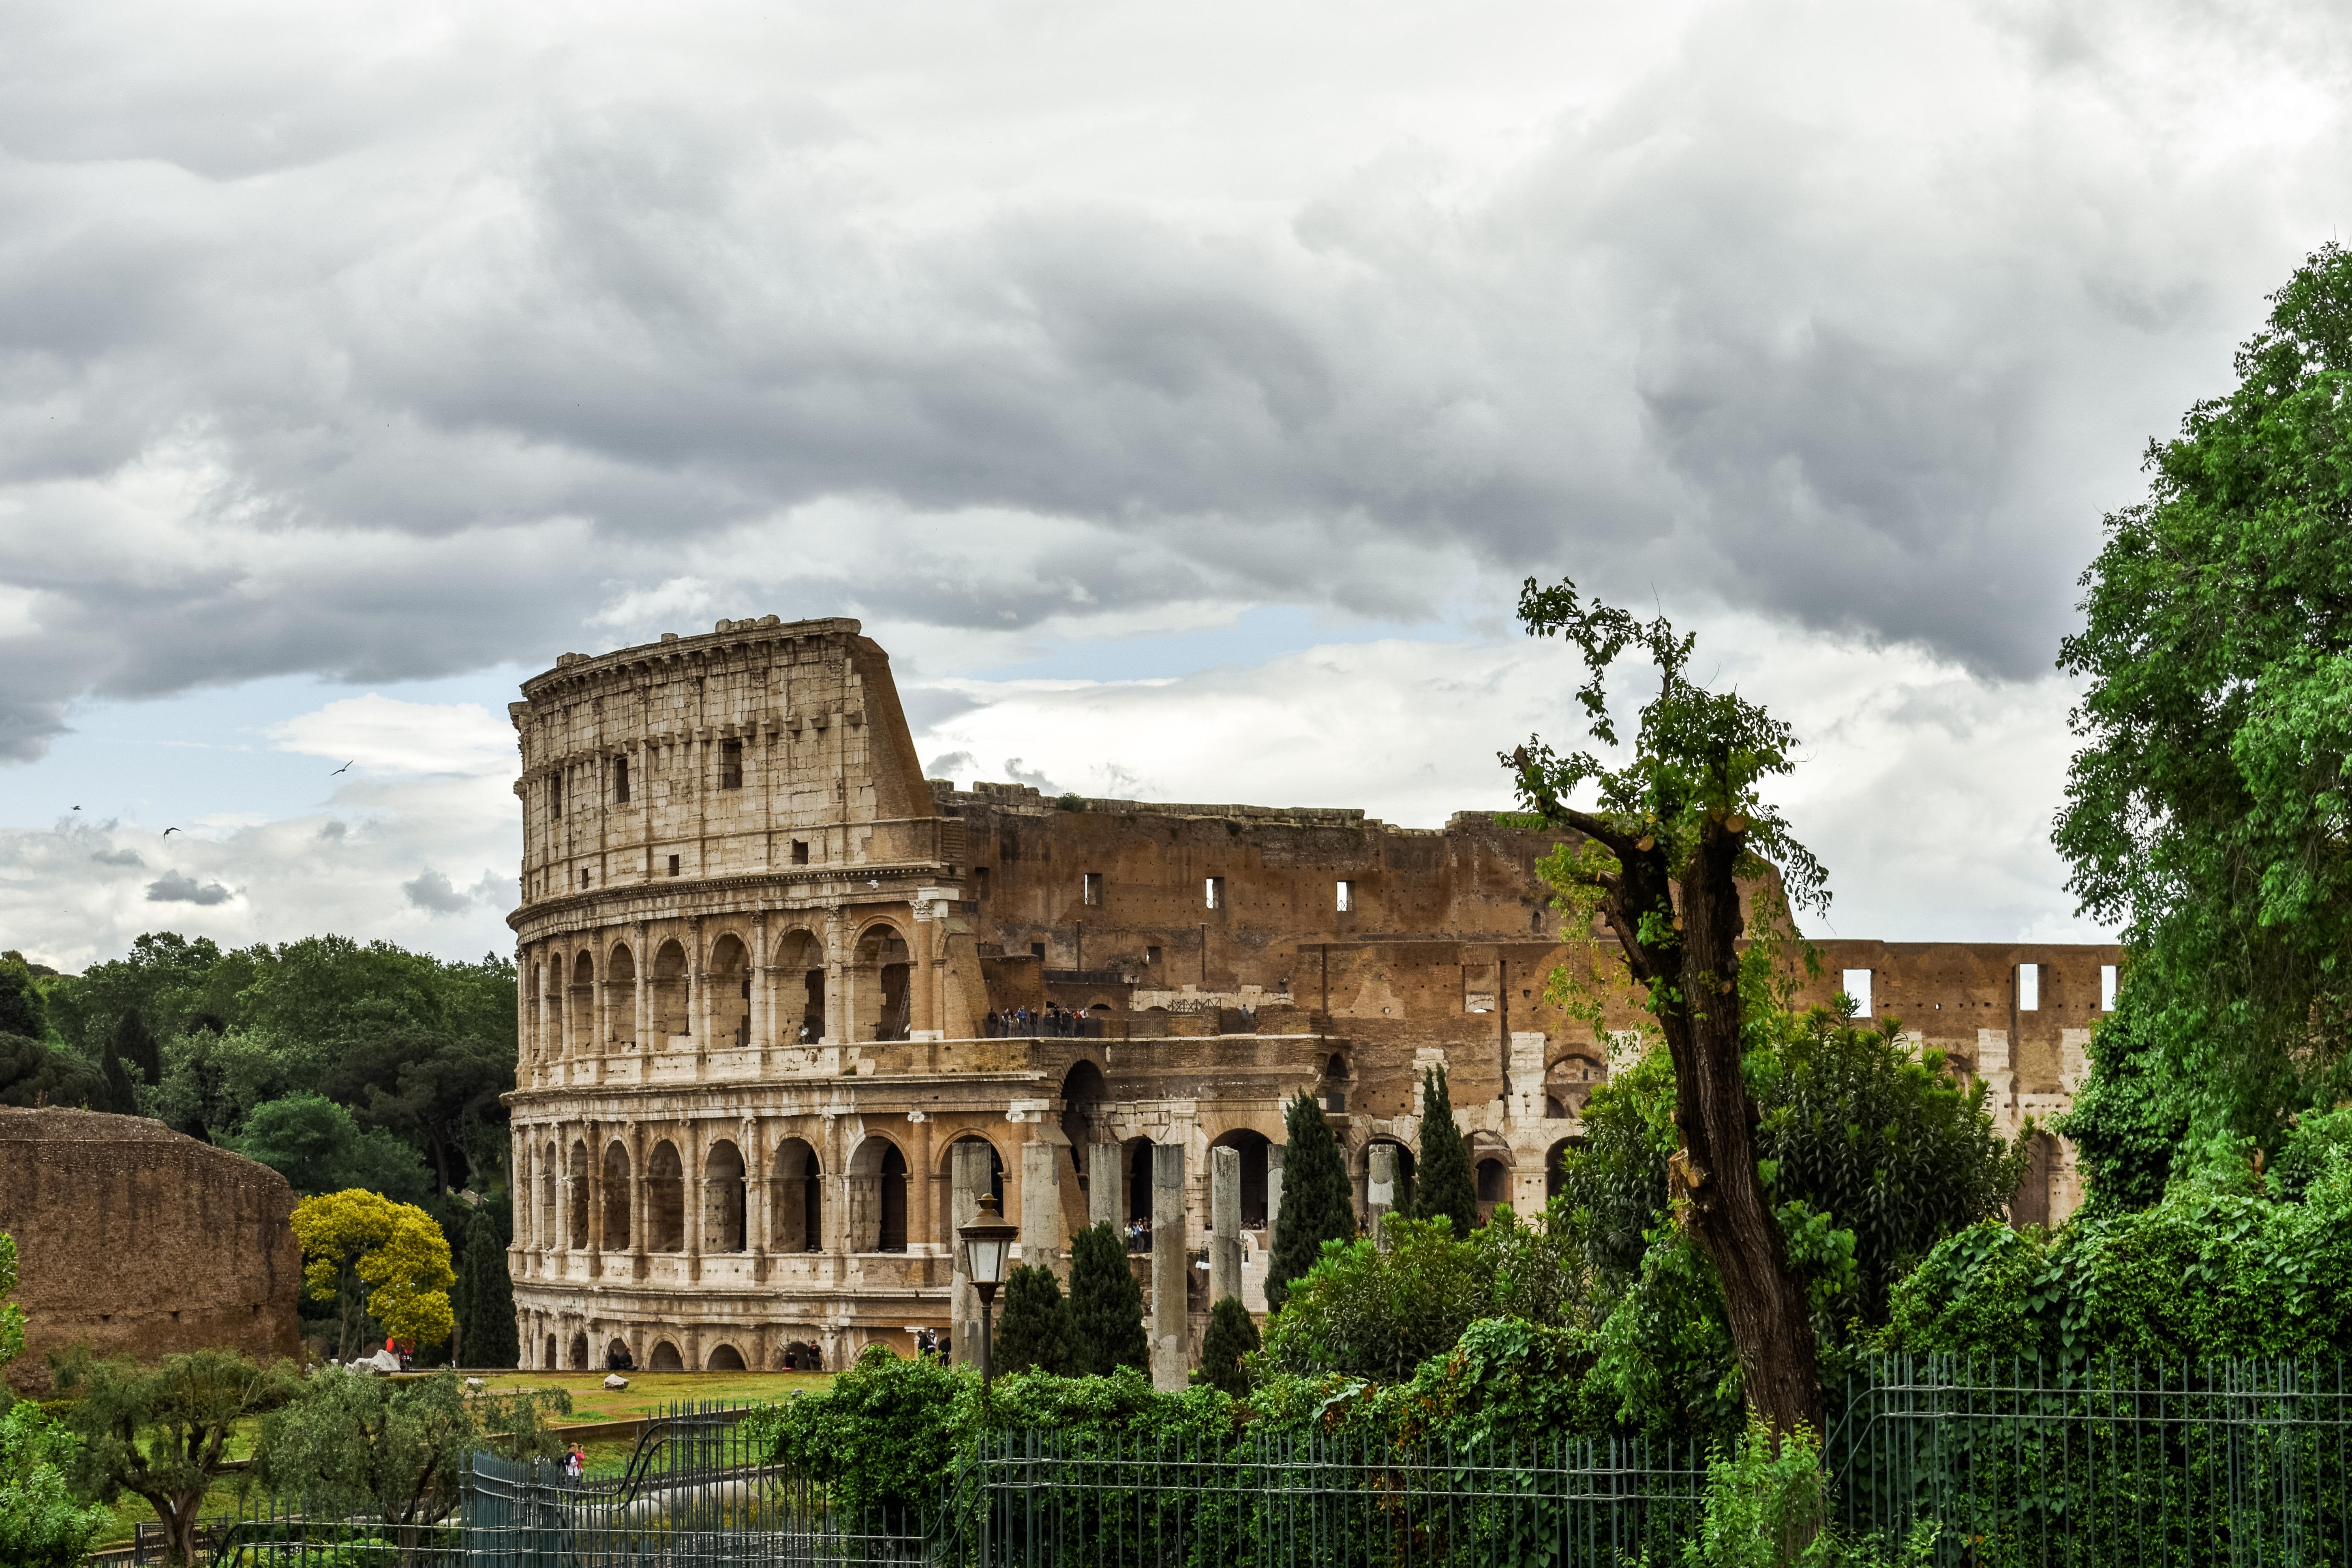 Three days in Rome - Colosseum